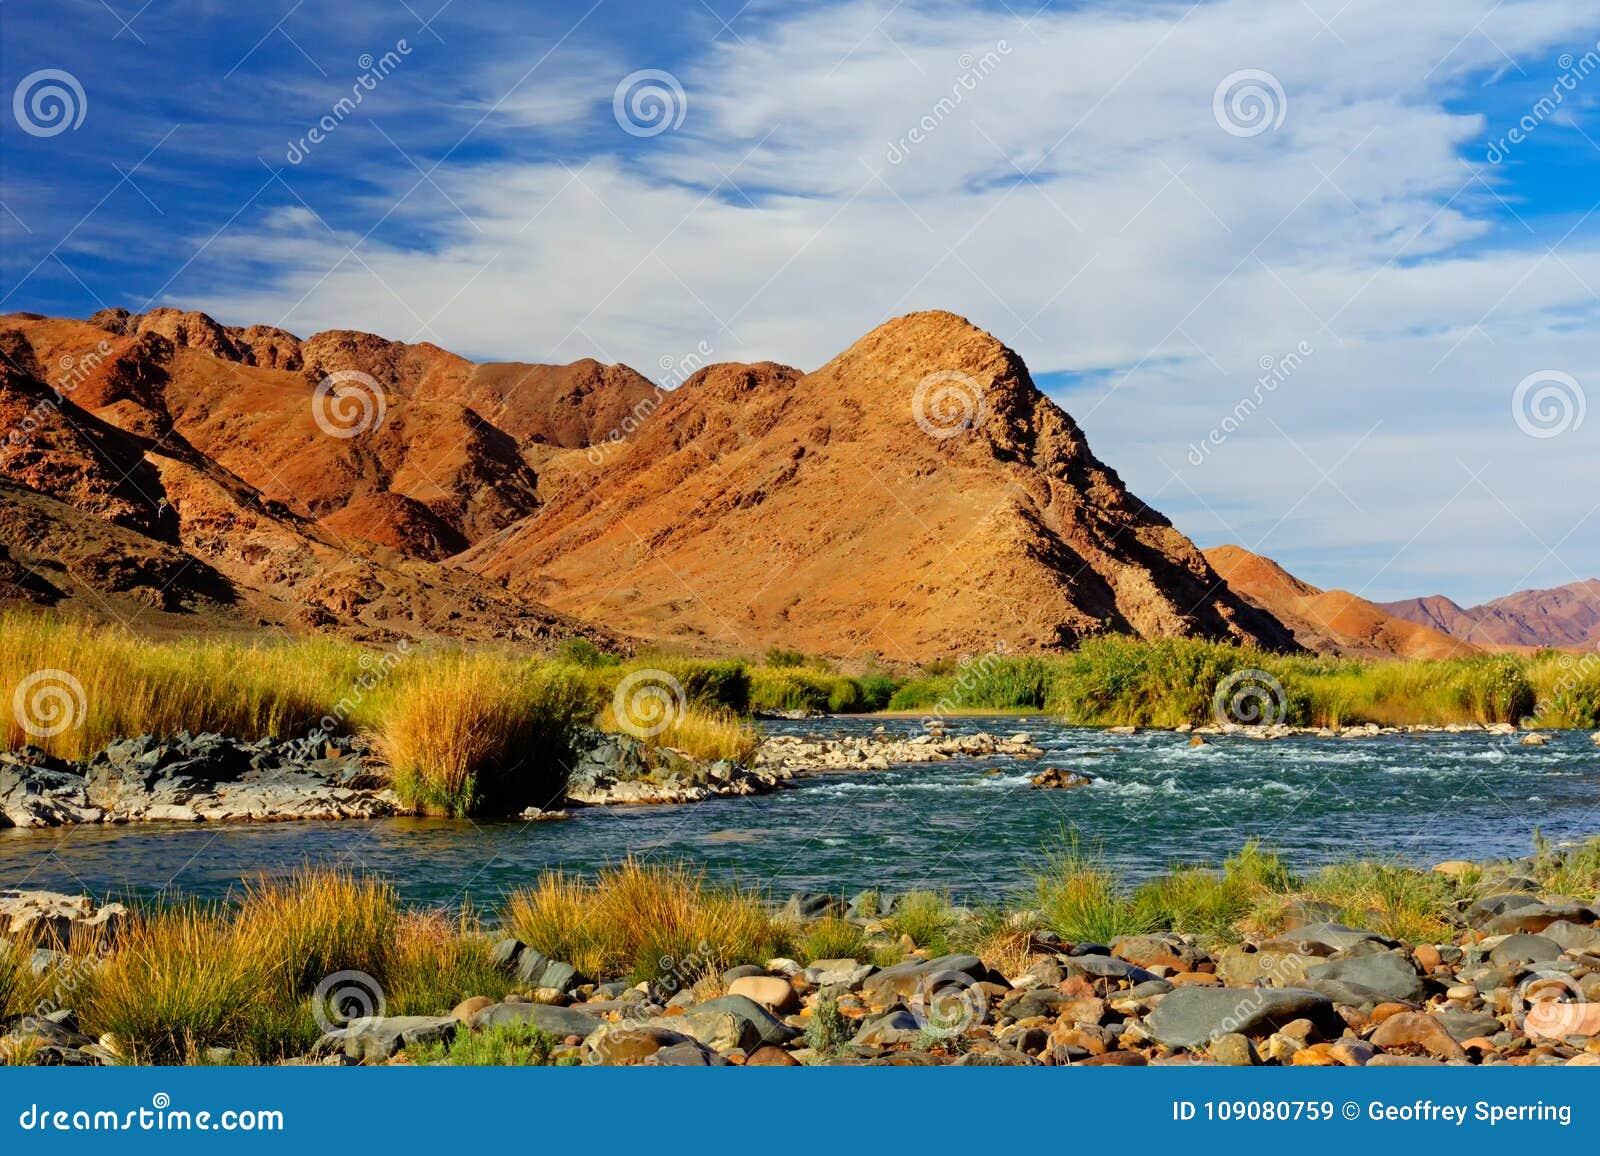 Roodachtige Bergenrivier en Blauwe Hemel